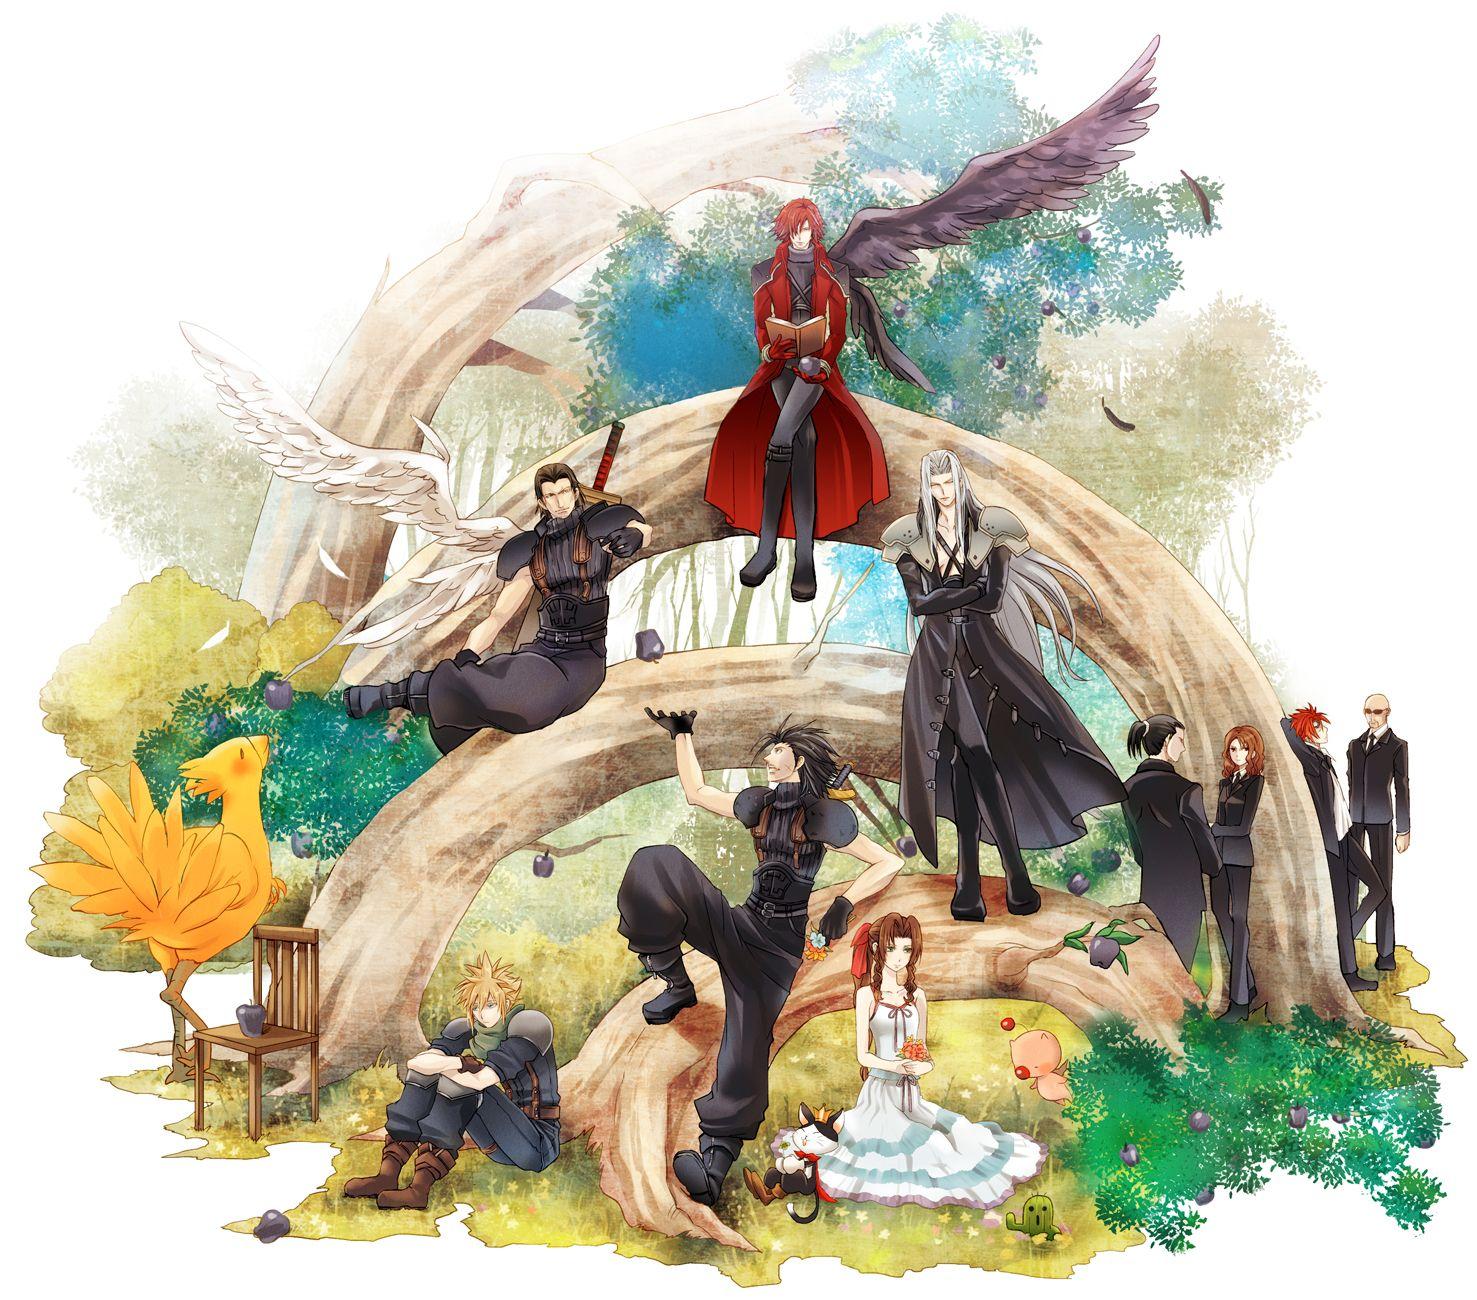 Final fantasy 7 fan art cerca con google videogames - Cloud strife fanart ...